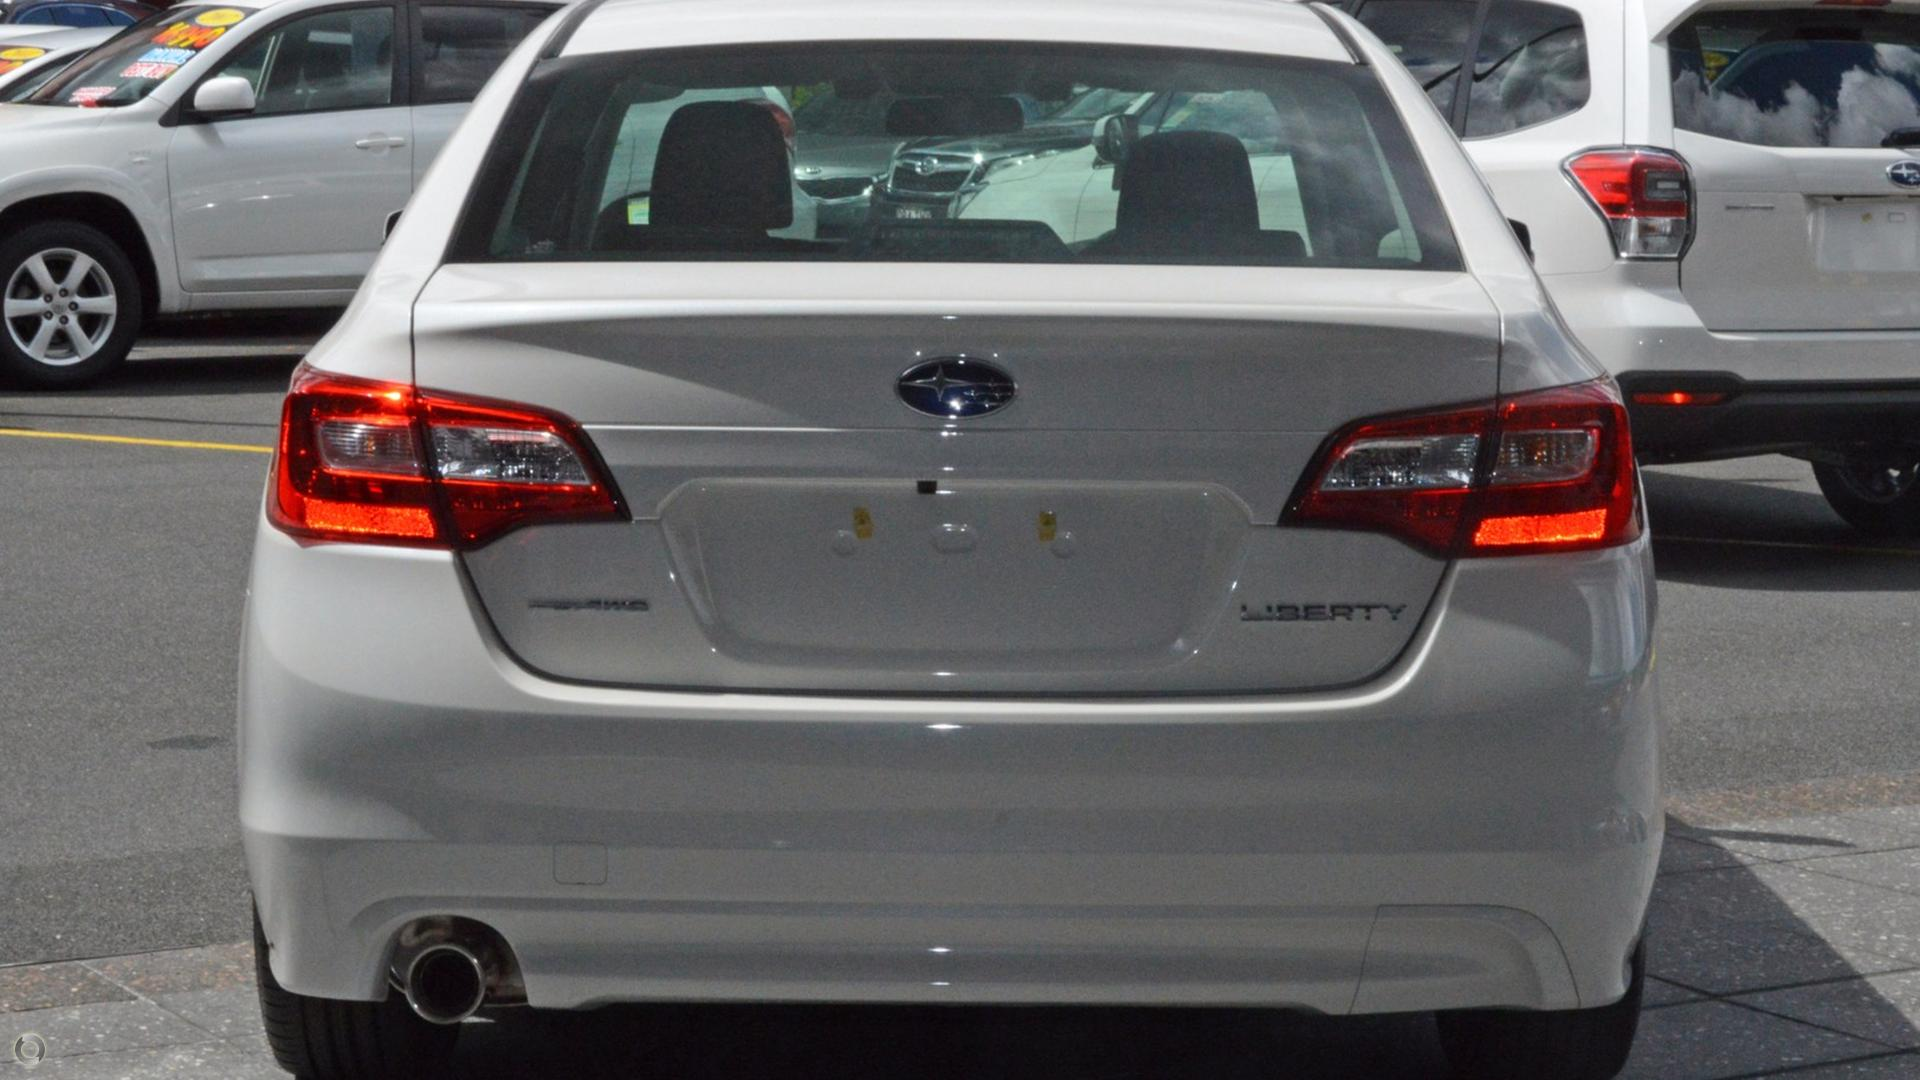 2017 Subaru Liberty 2.5i Fleet Edition 6GEN